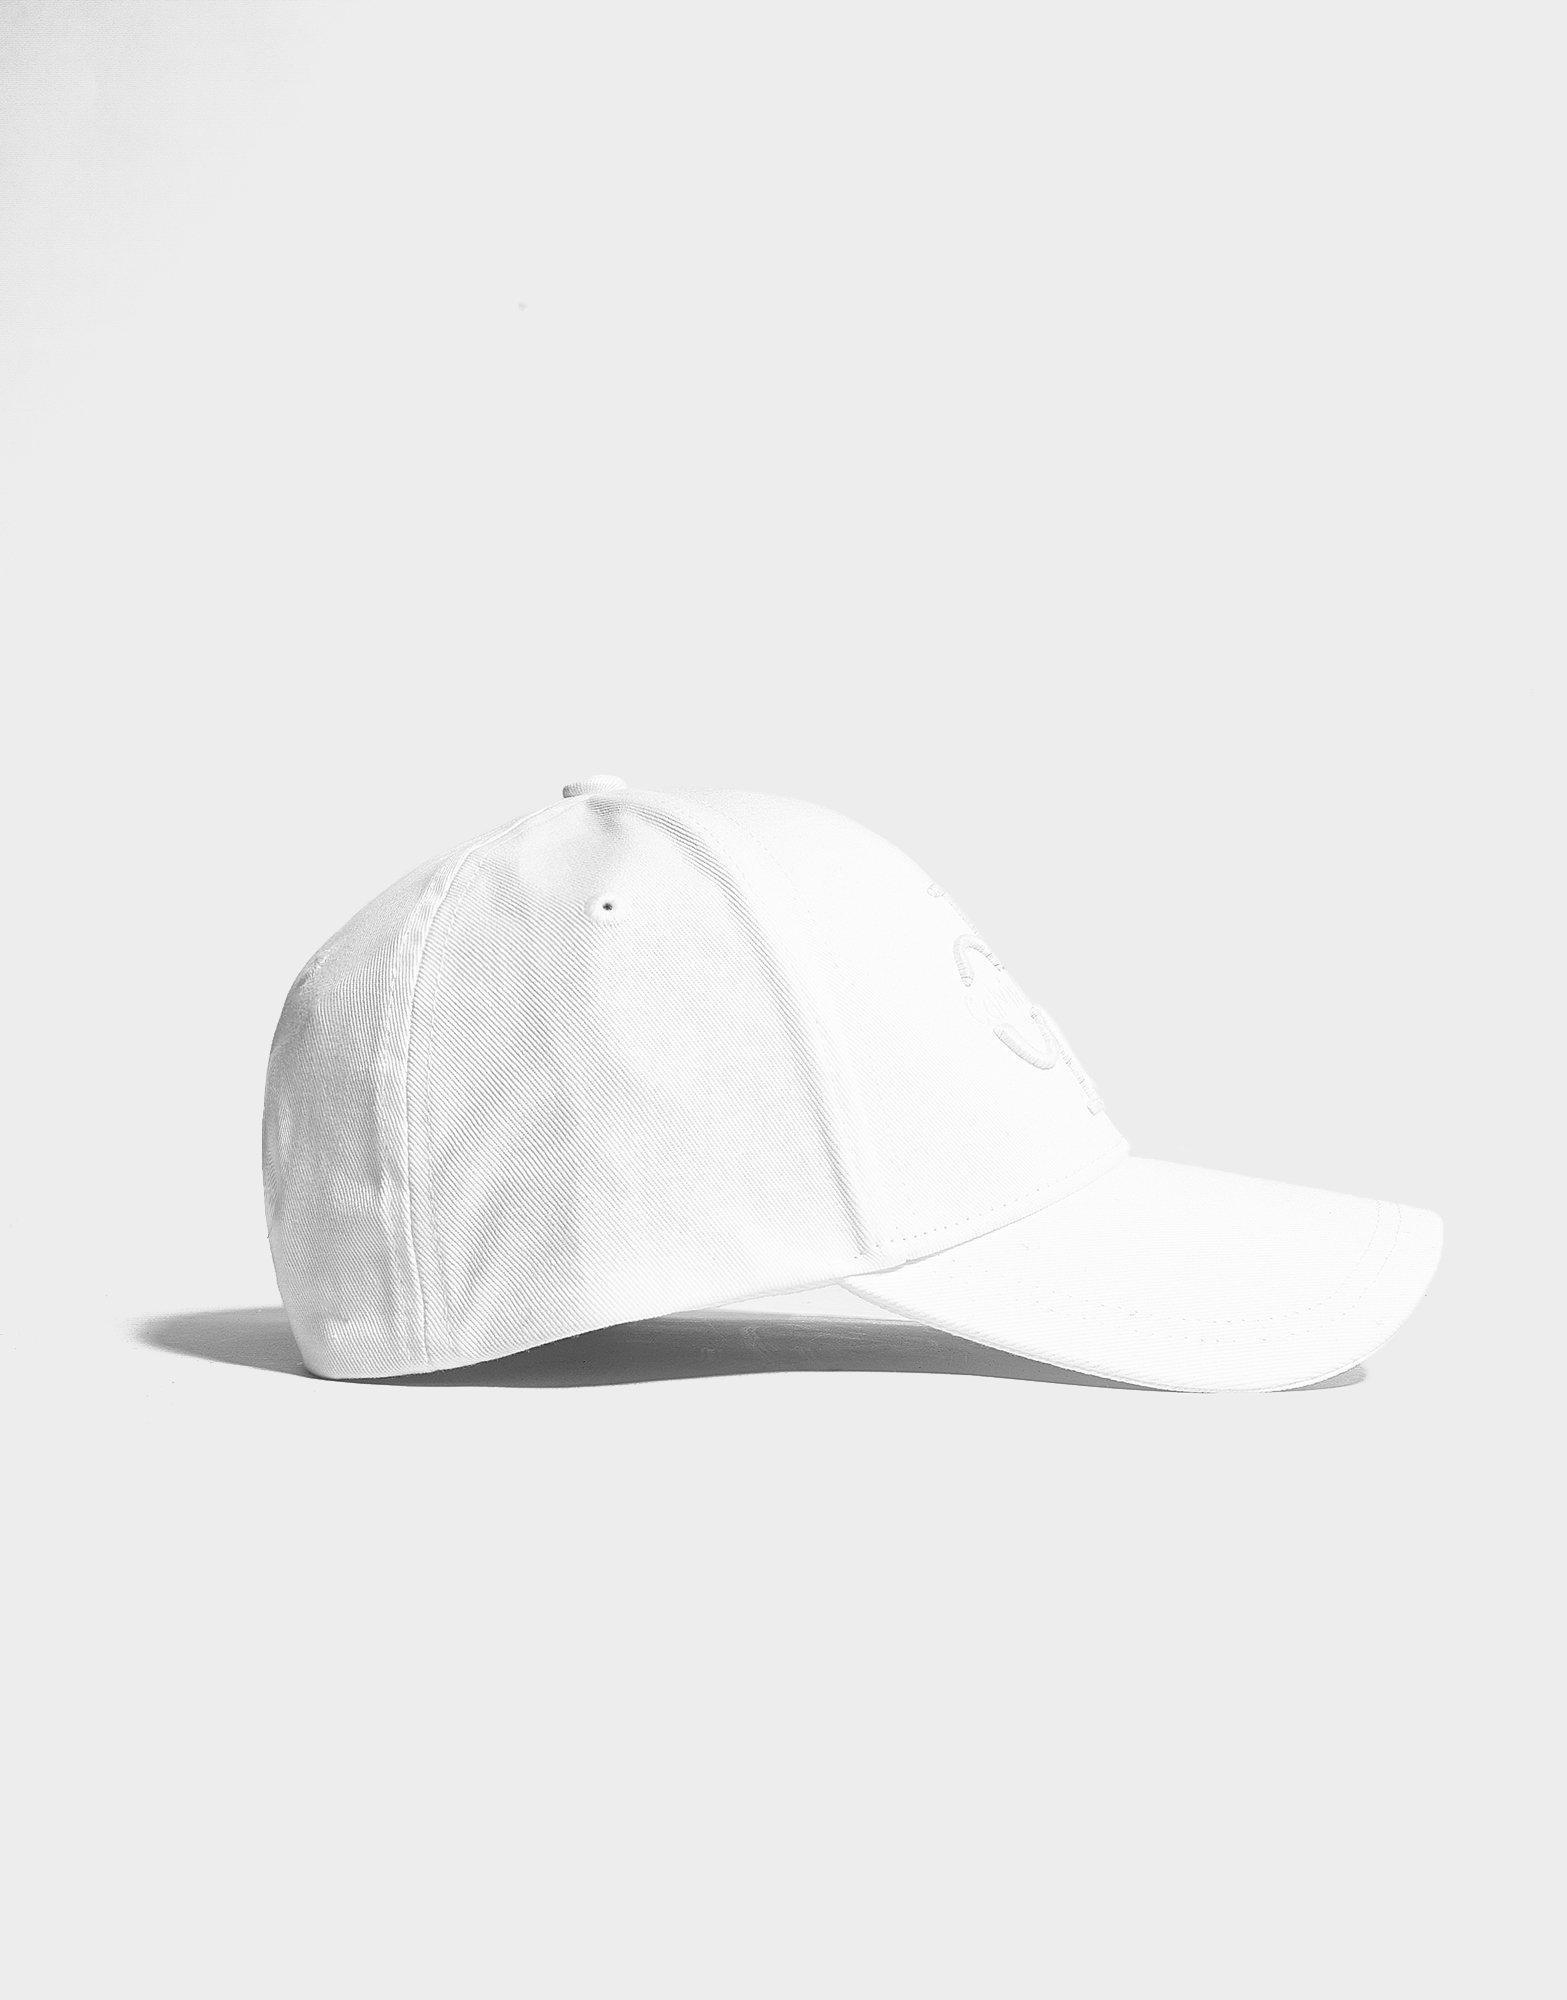 989a306de22 Calvin Klein 205W39Nyc Jeans Reissue Cap in White for Men - Lyst